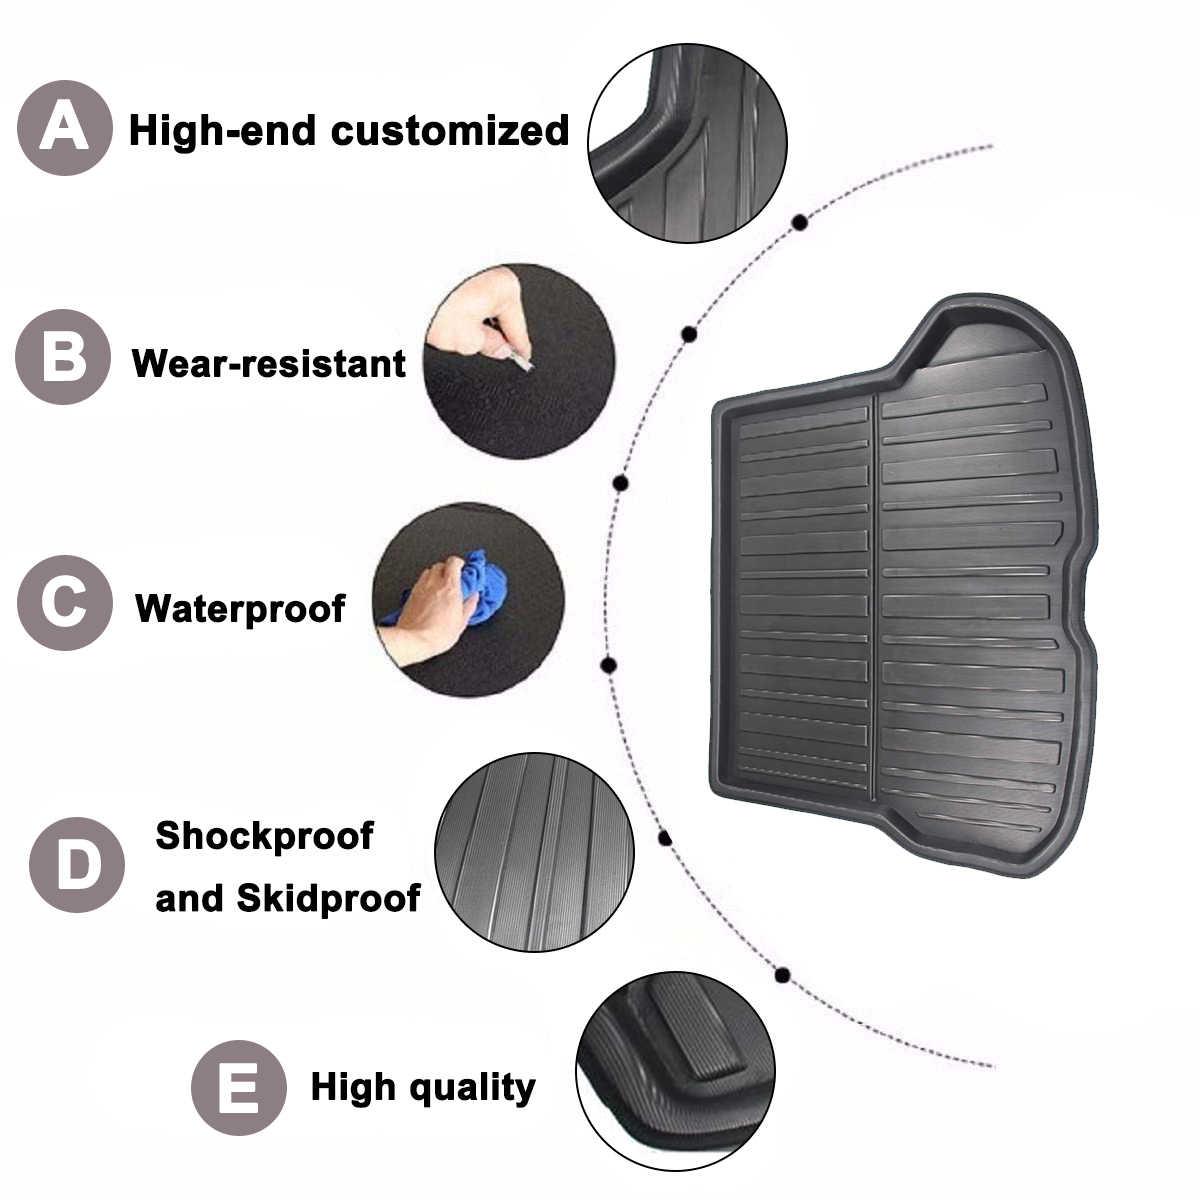 Tylna pokrywa bagażnika matowa mata wkładka do bagażnika dywan na podłogę taca samochodowa wkładka do bagażnika Cargo Mud antypoślizgowa do Volvo XC40 2017-2019 wodoodporna